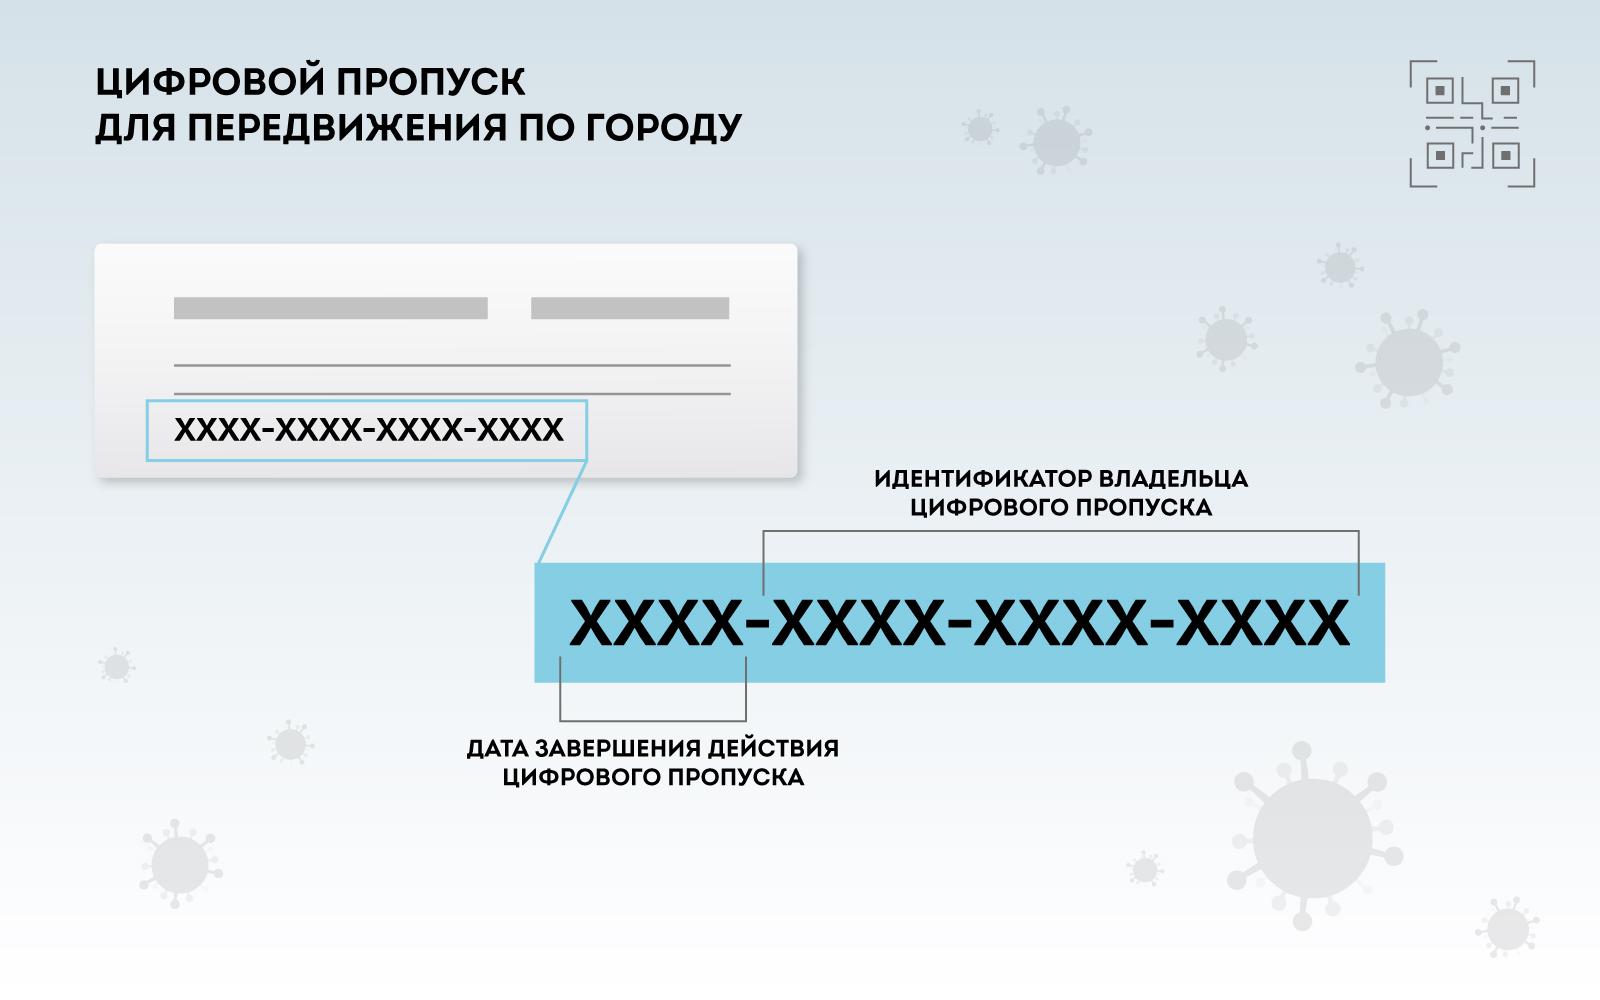 https://cdn.sobyanin.ru/uploads/storage/blog/11-04-web-000031.jpg